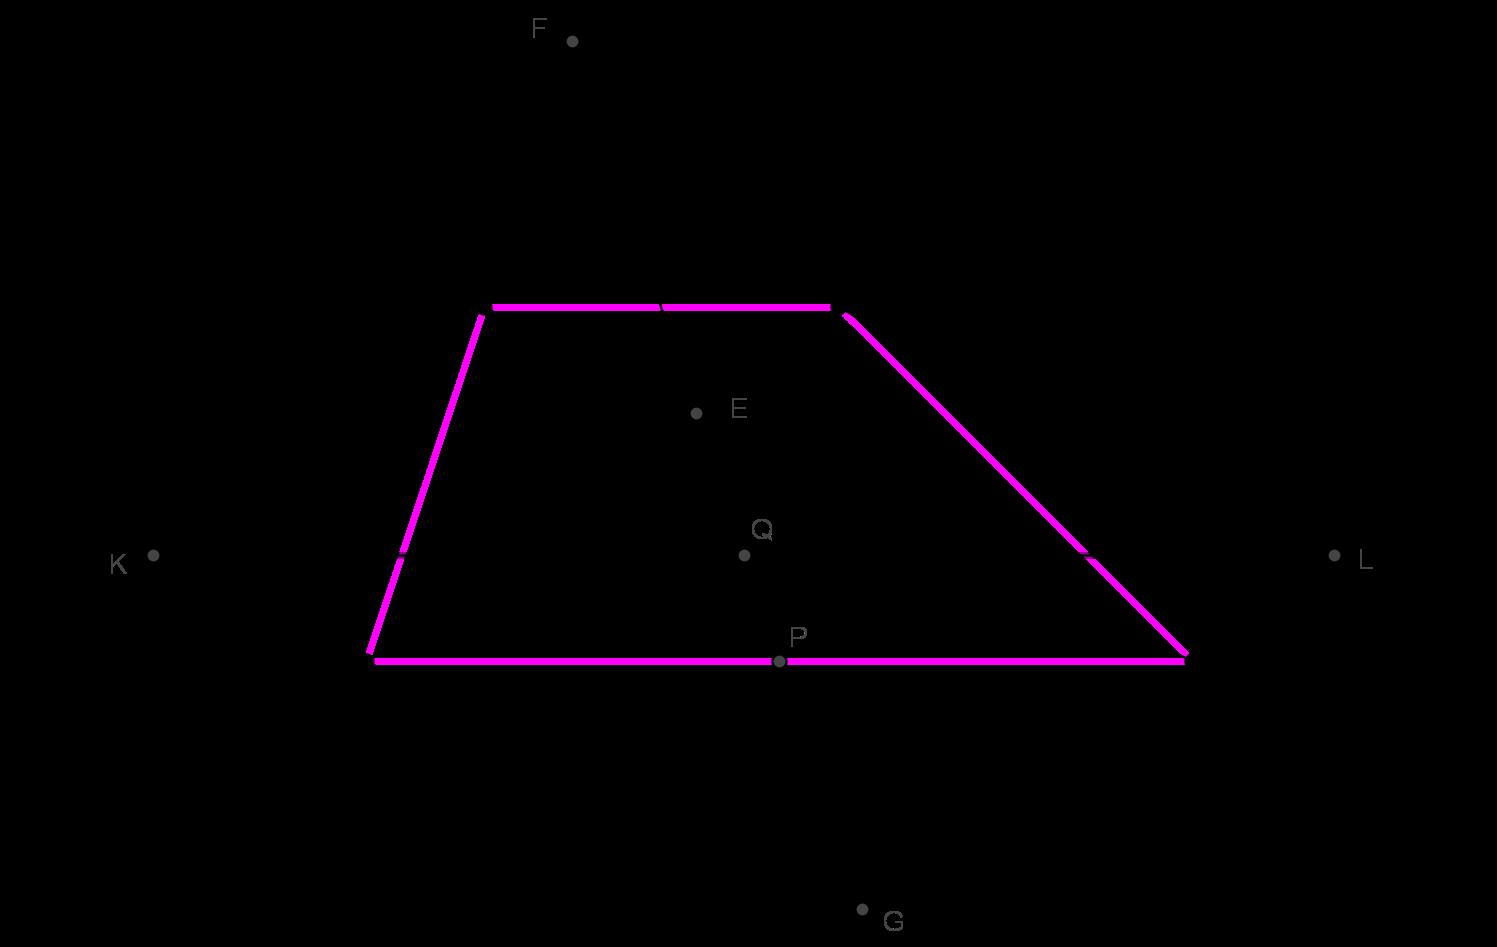 Solusi Soal Geometri Osn Matematika Sma 2014 Tuturwidodo Com